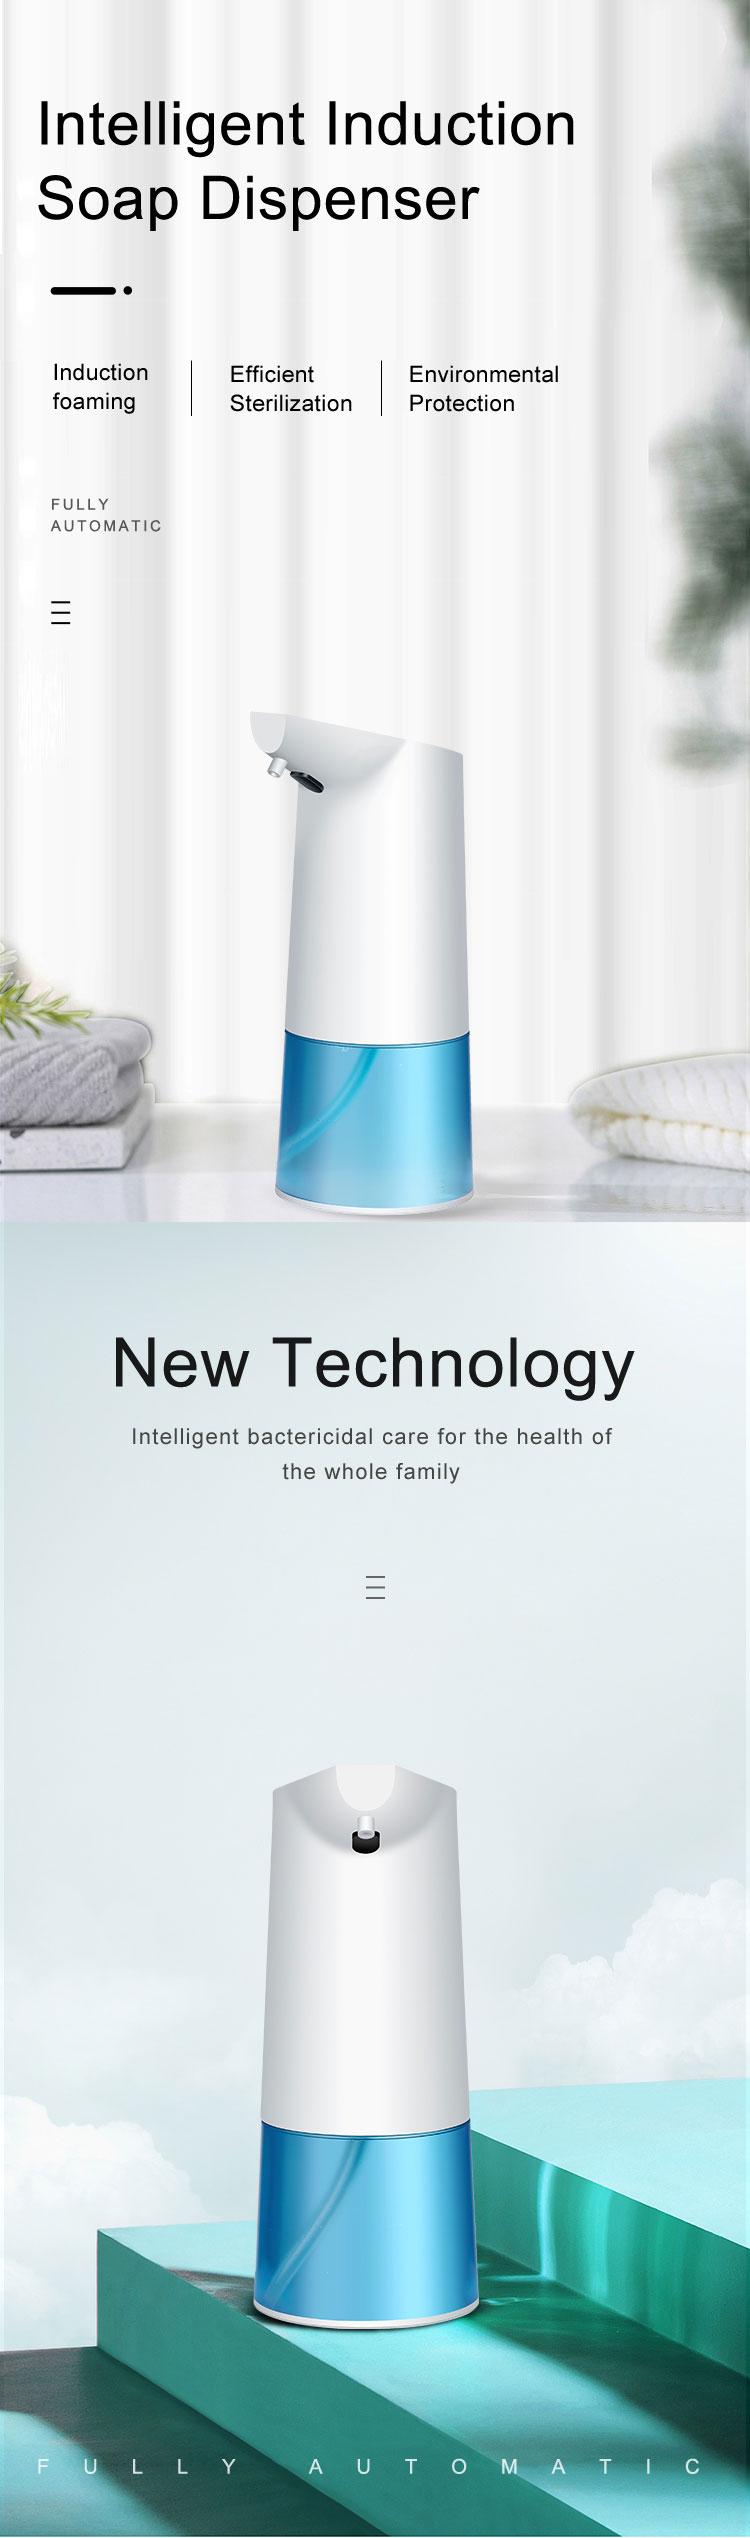 Touchless Bathroom Dispenser Smart Sensor Liquid Soap Dispenser for Kitchen Hand Free Automatic Soap Dispenser 3